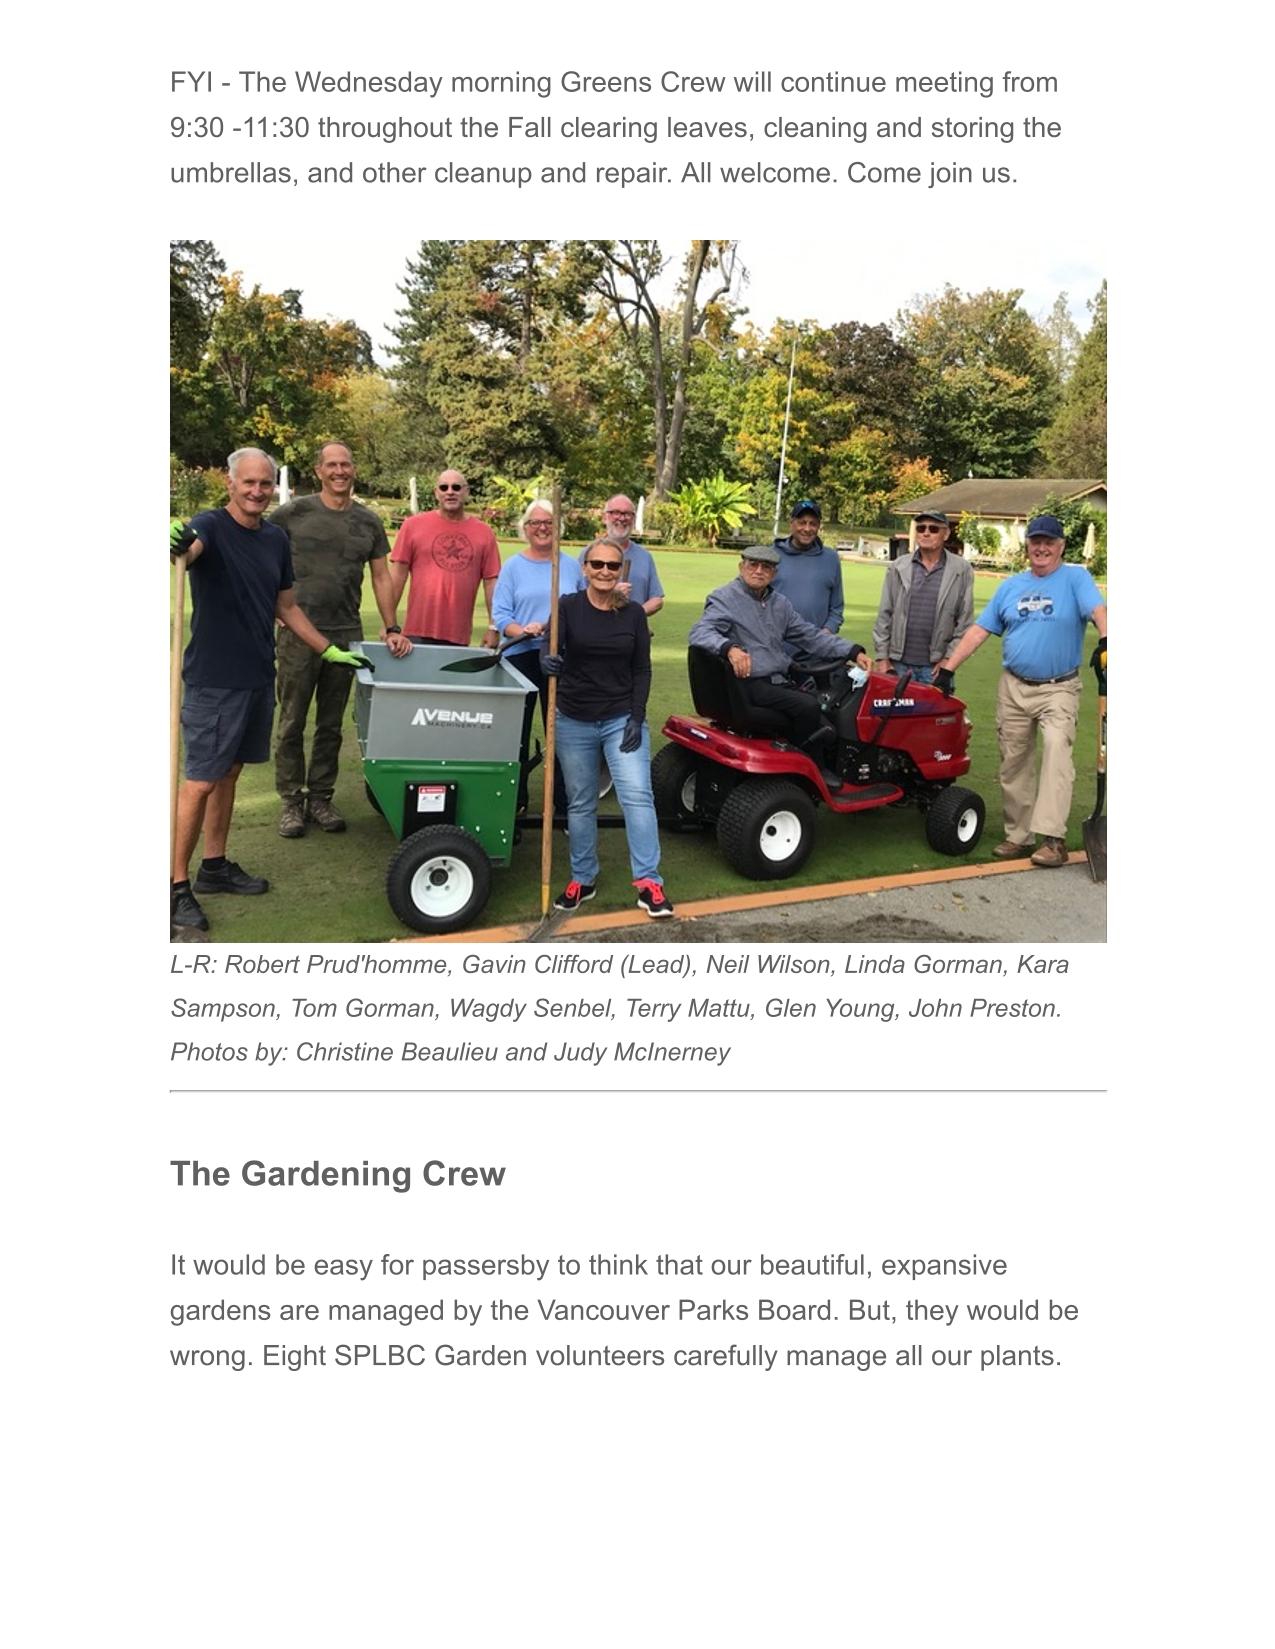 Stanley_Park_Lawn_Bowling_Club_News-2.jpg